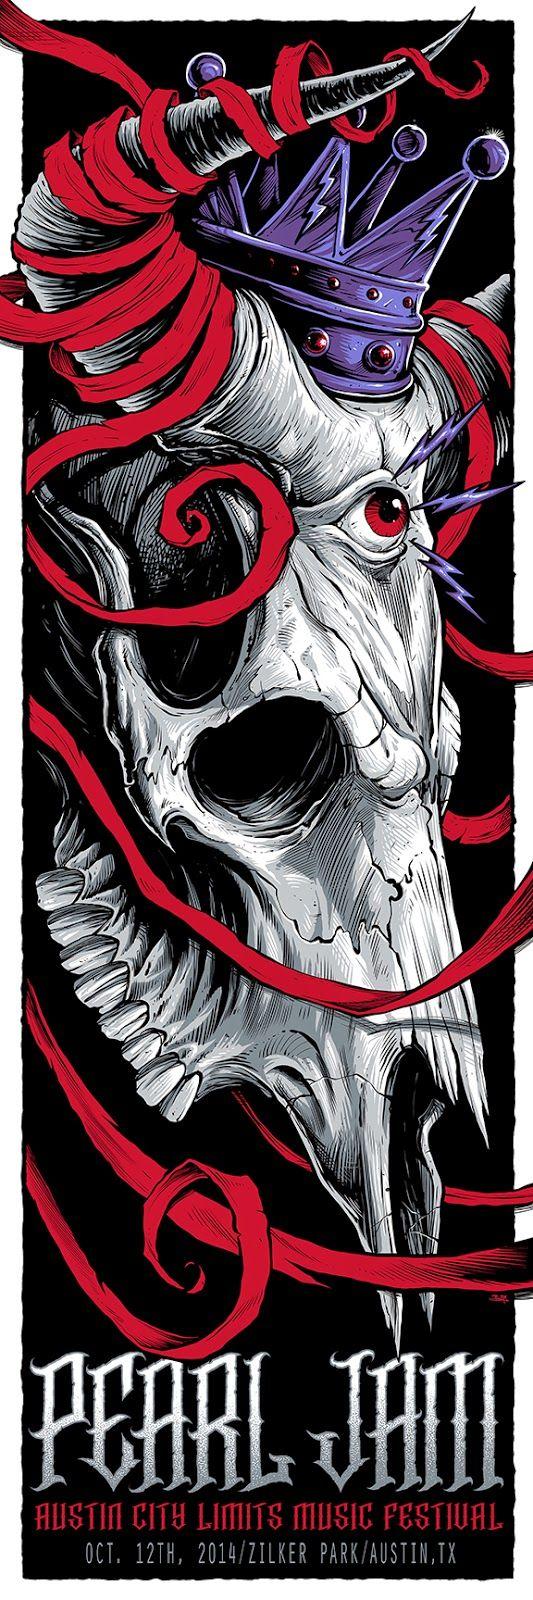 INSIDE THE ROCK POSTER FRAME BLOG: Pearl Jam Brandon Heart Austin City Limits Poster AP Sale & F4Dreams Poster Sale